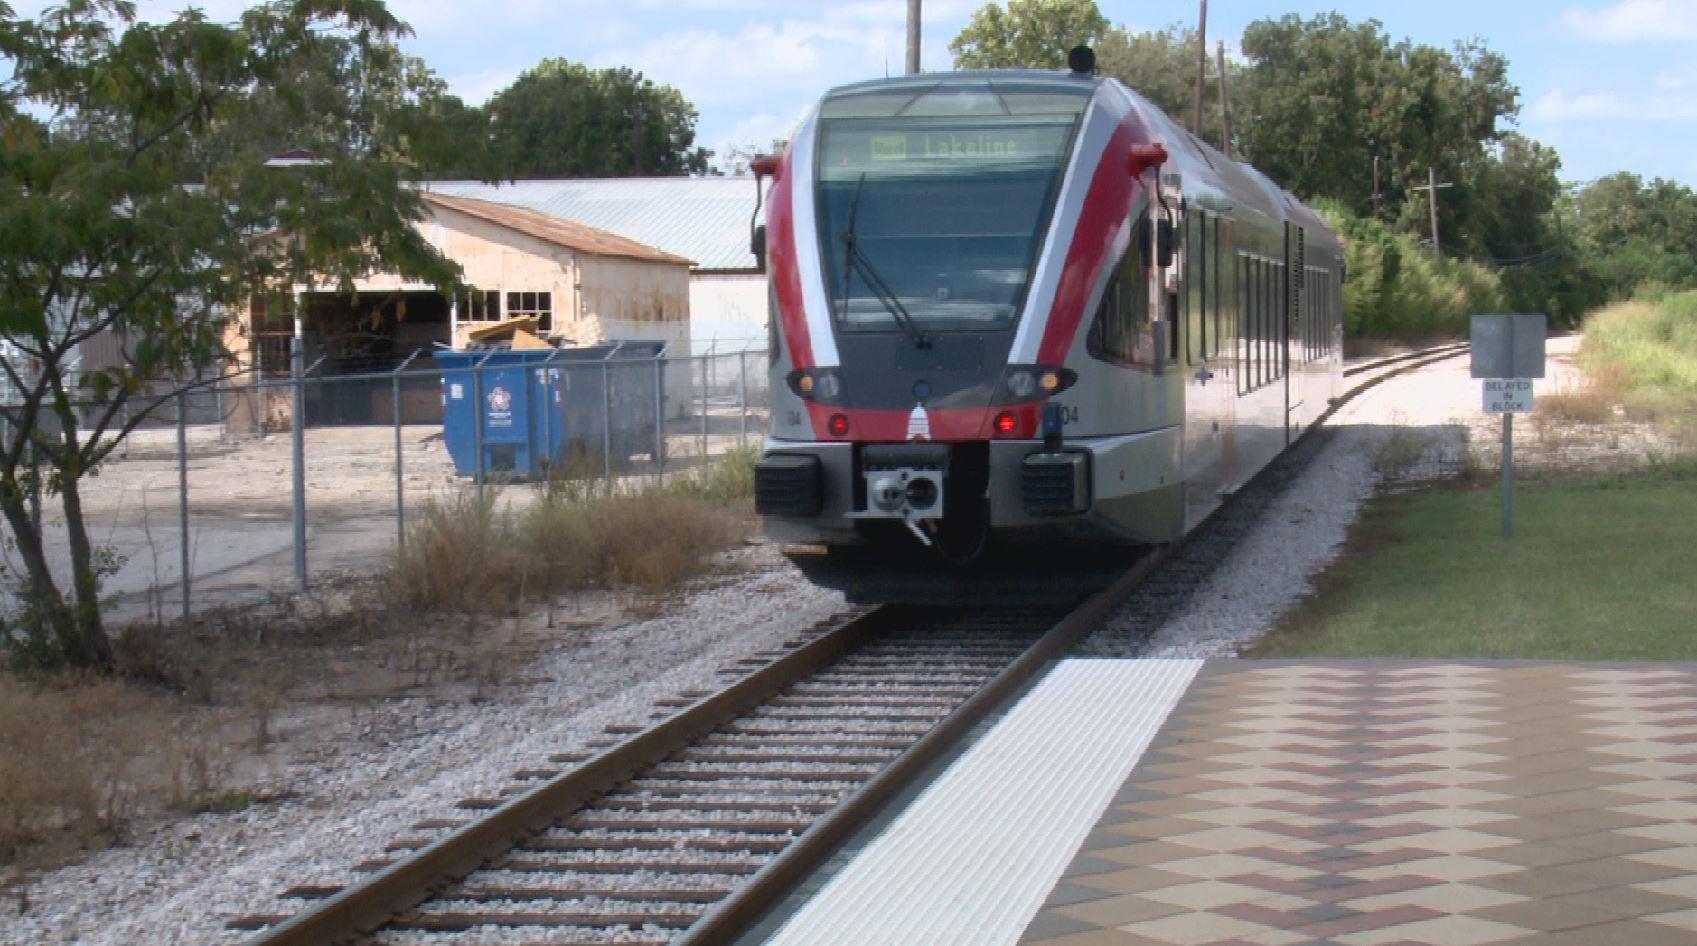 MetroRail train_373074